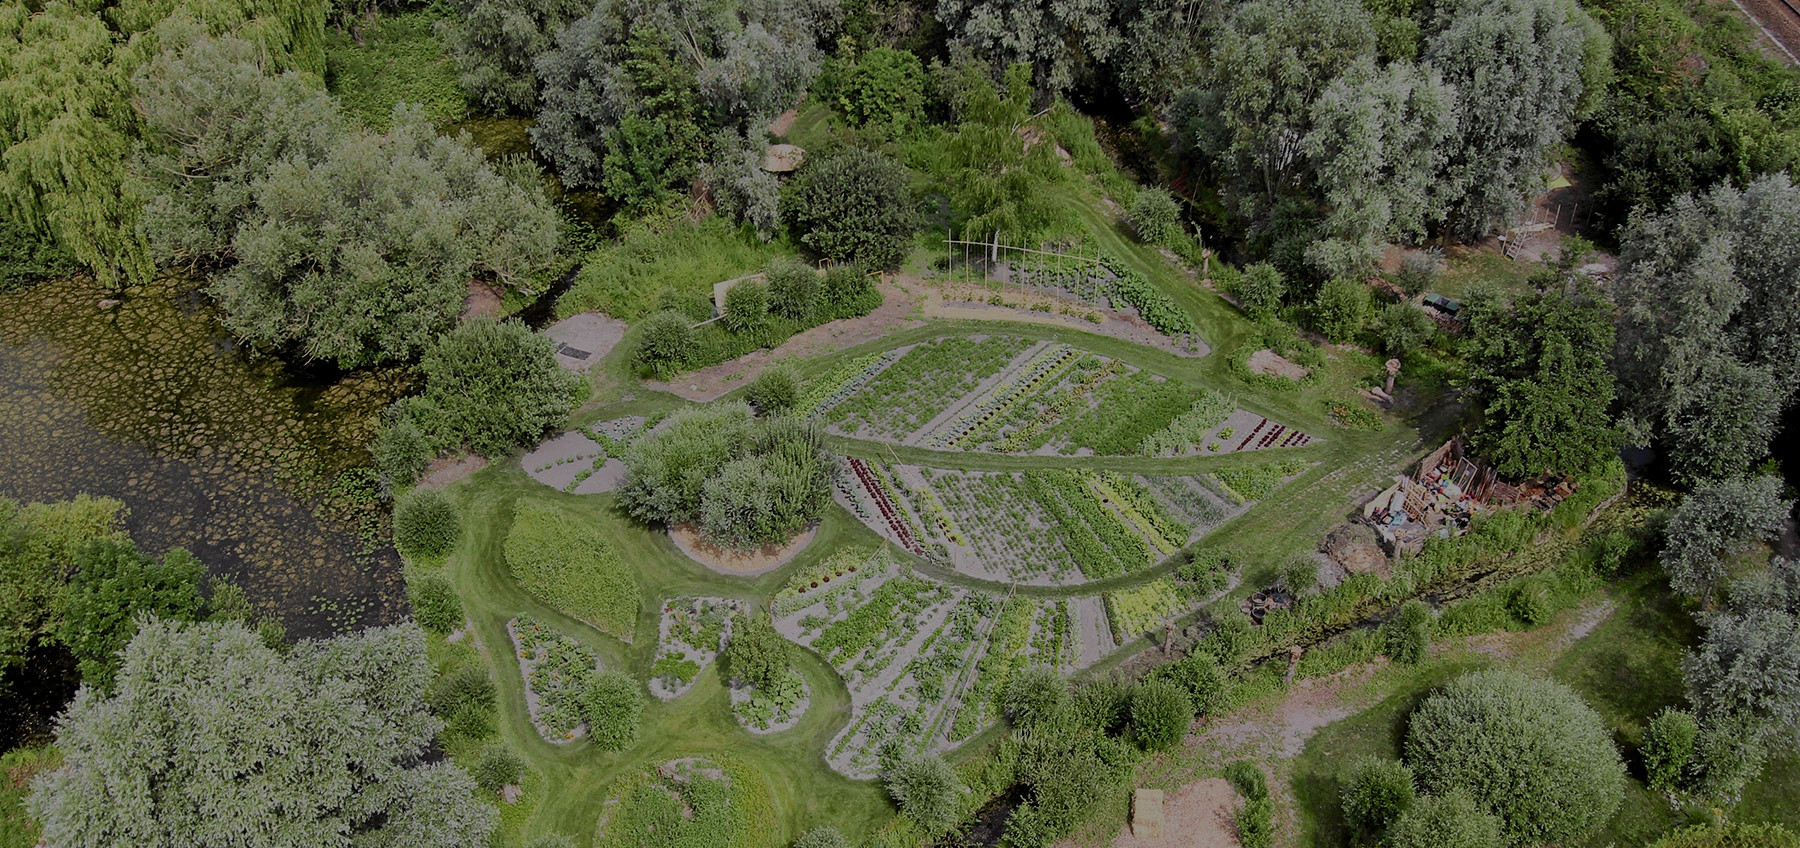 design terre permaculture agriculture urbaine autonomie ferme